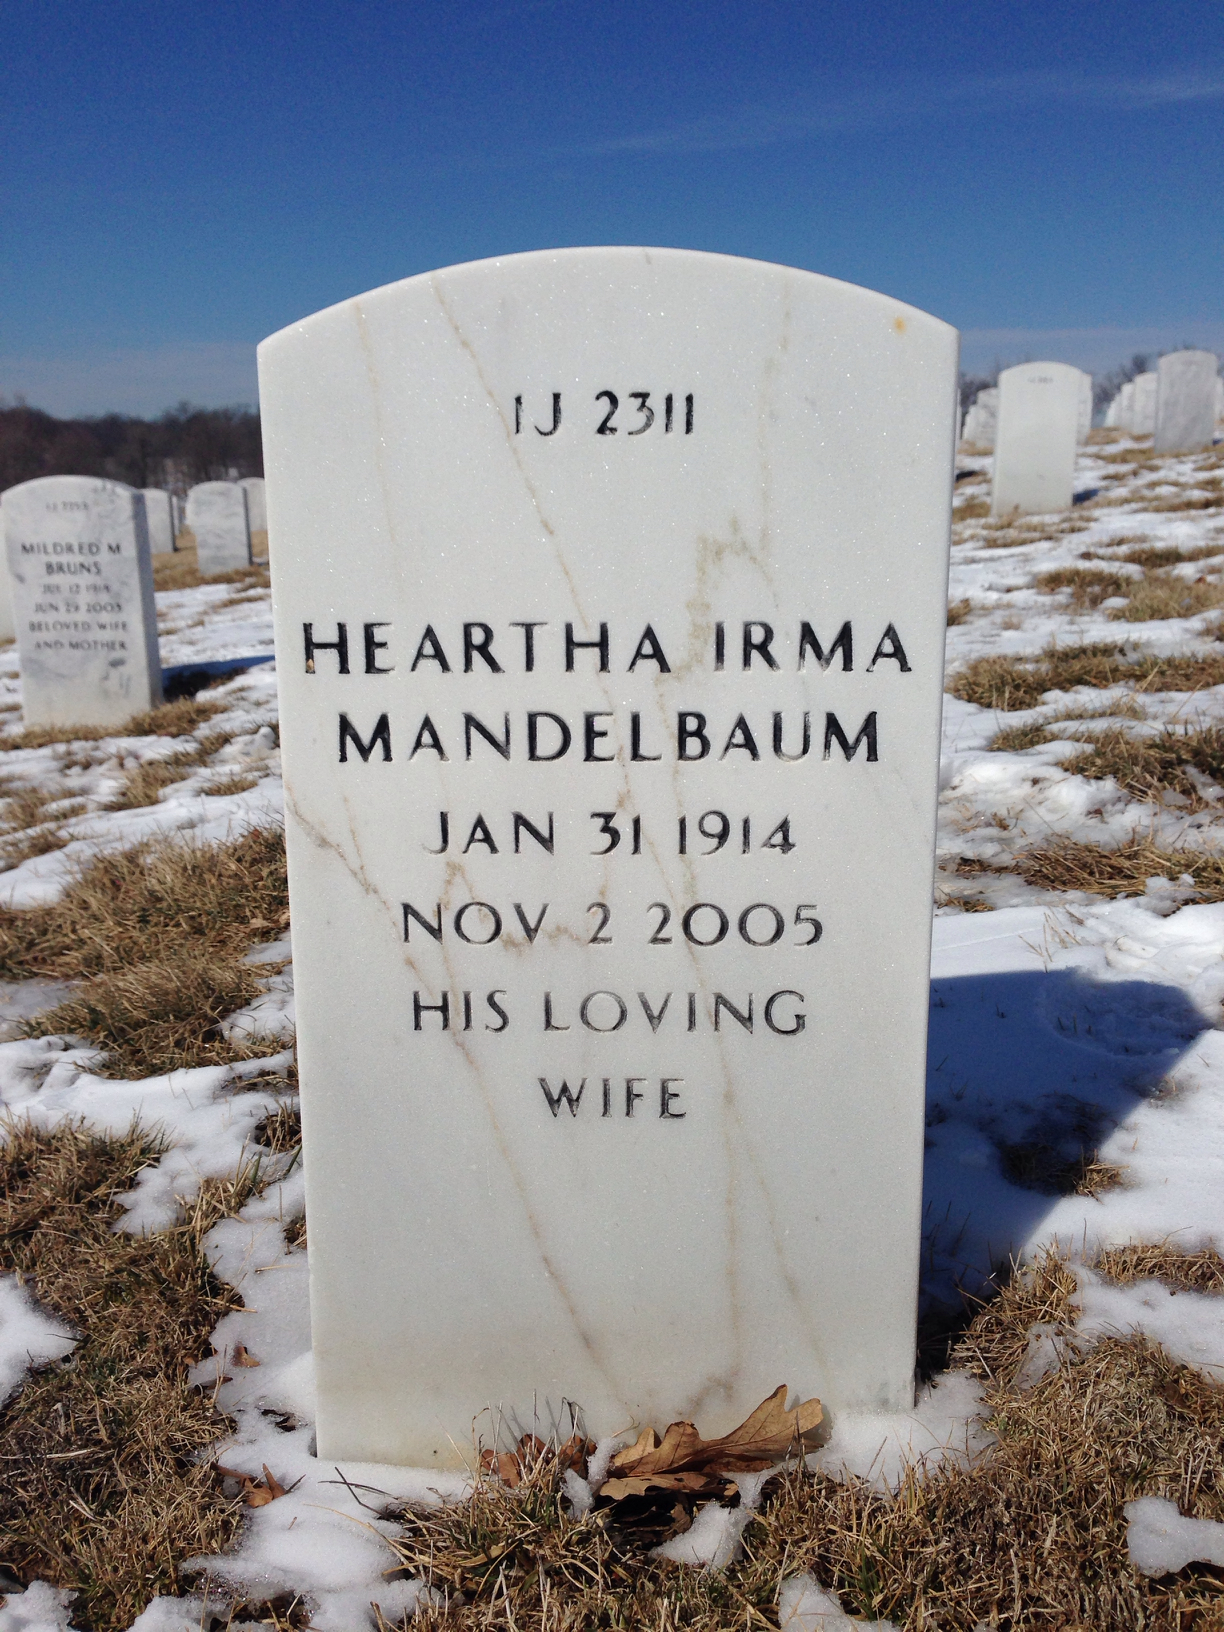 Heartha Irma Mandelbaum